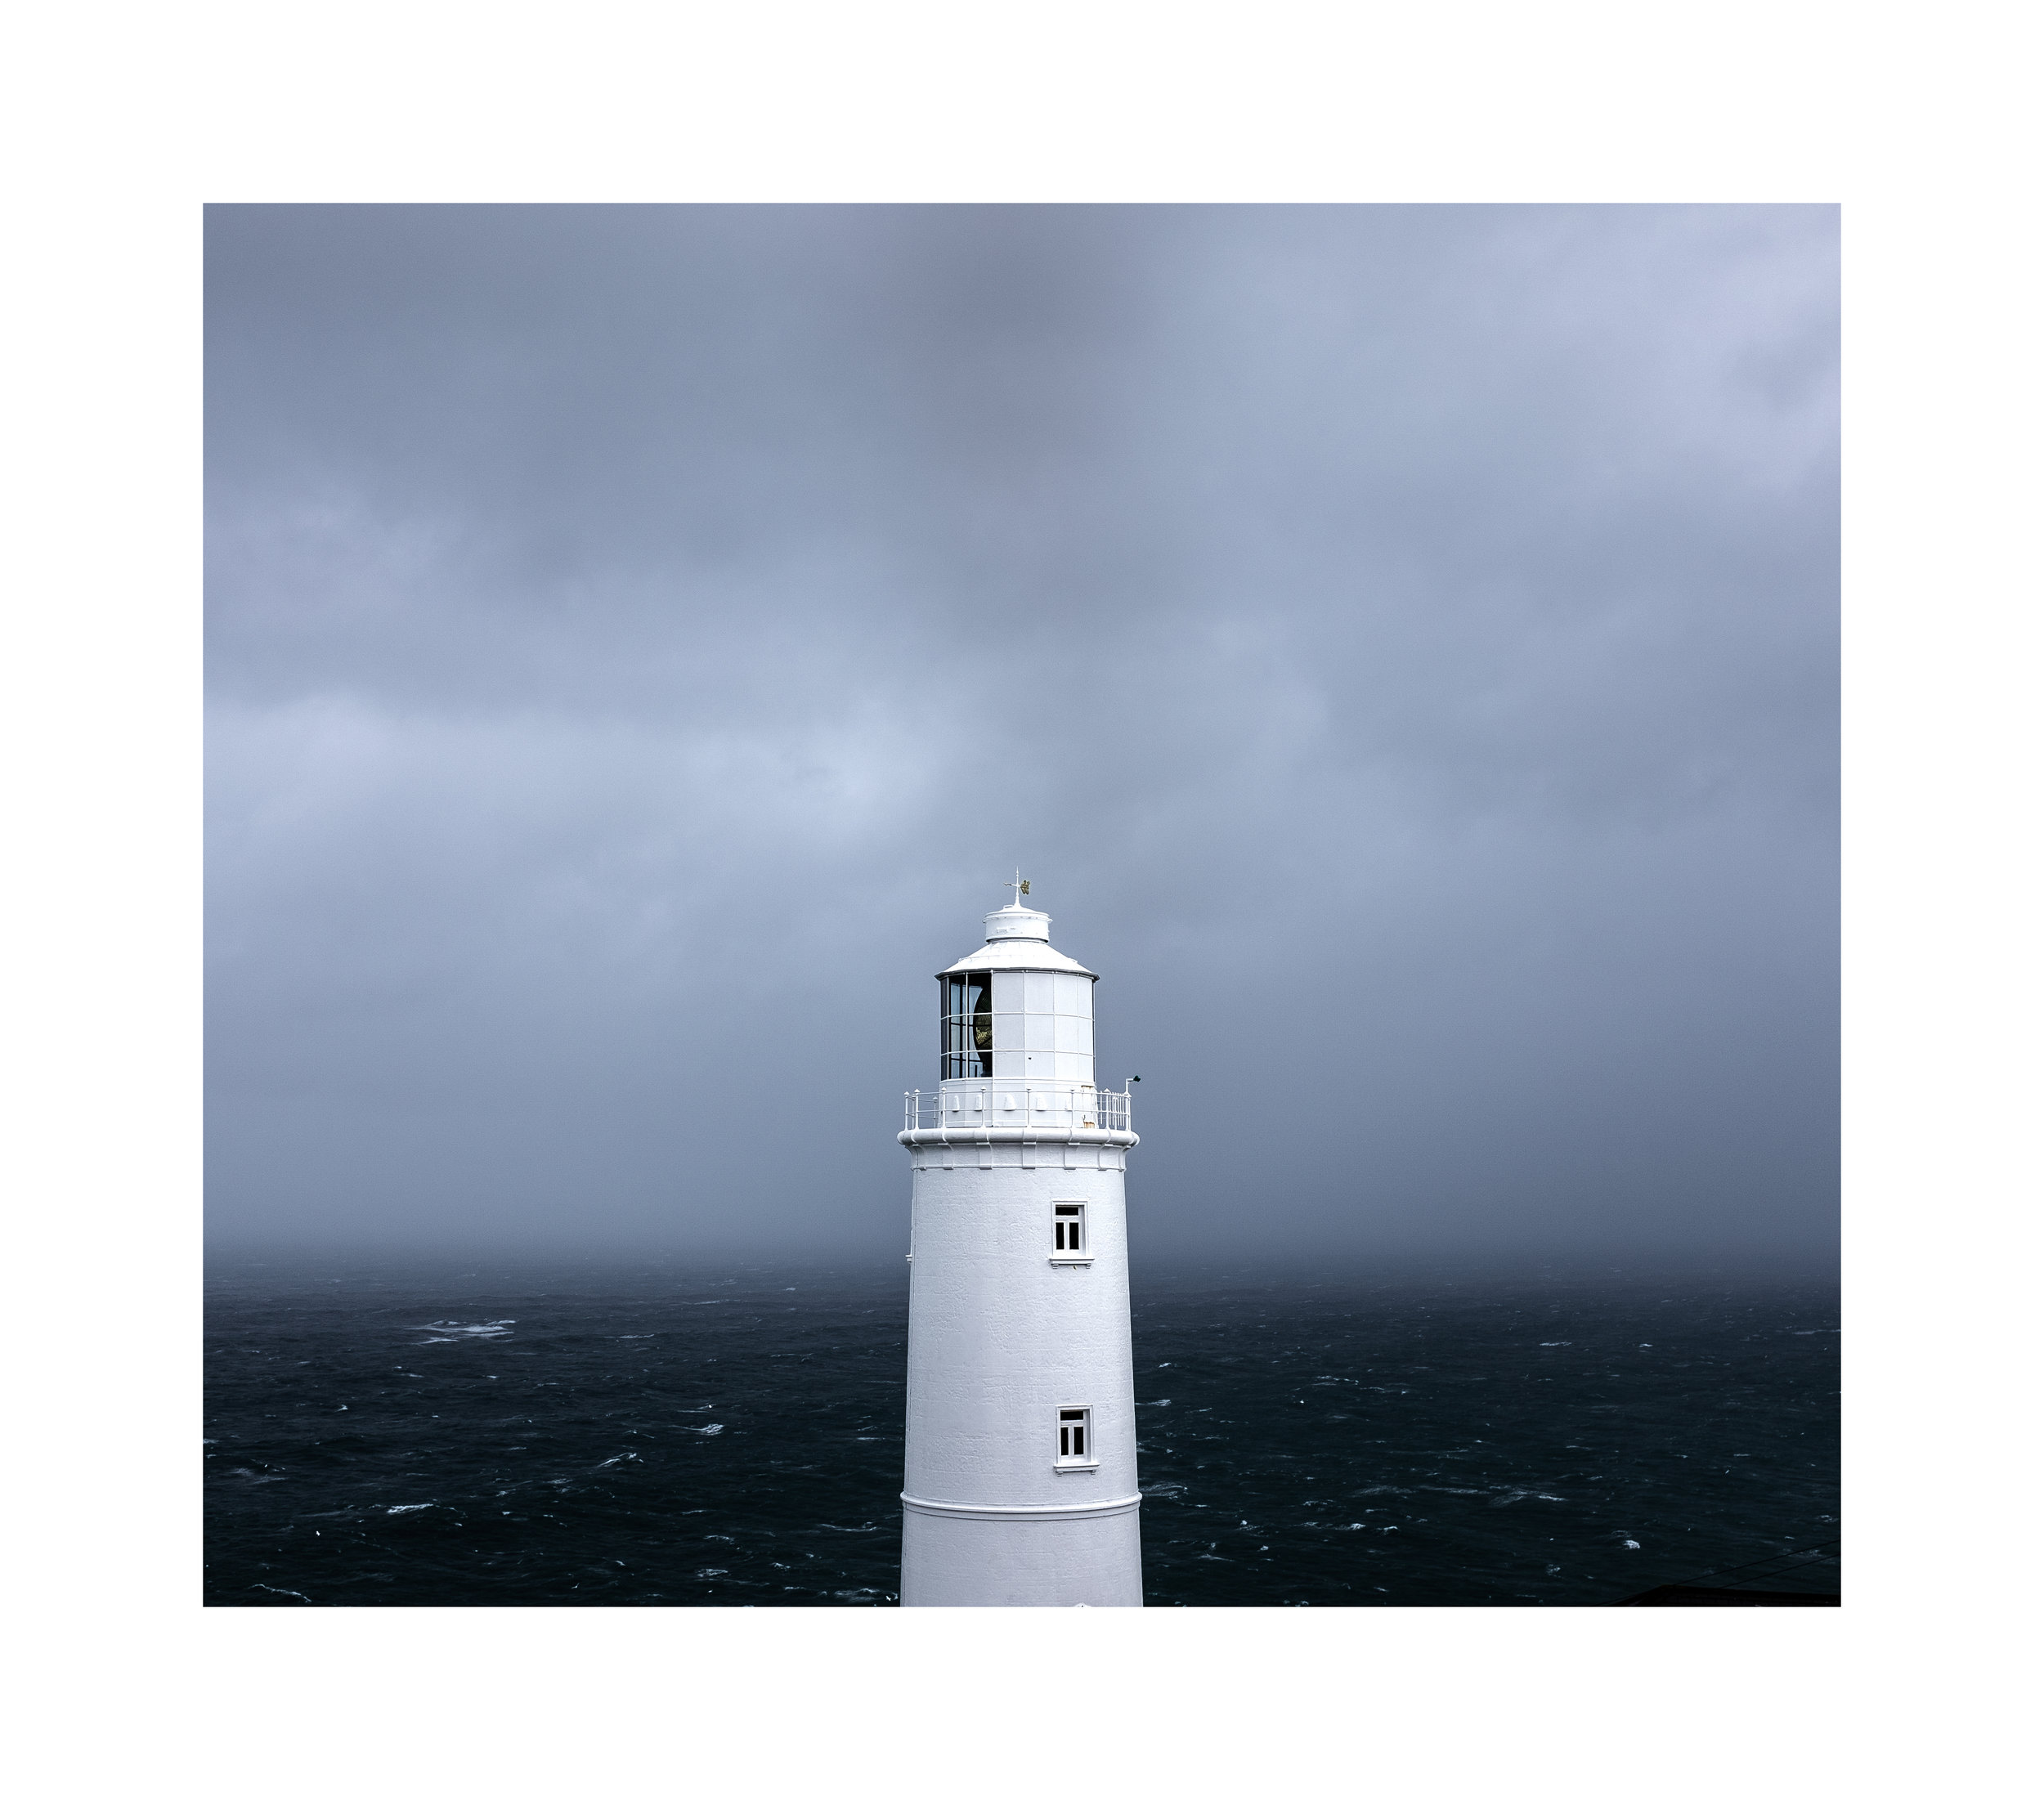 LighthouseTrevose.jpg